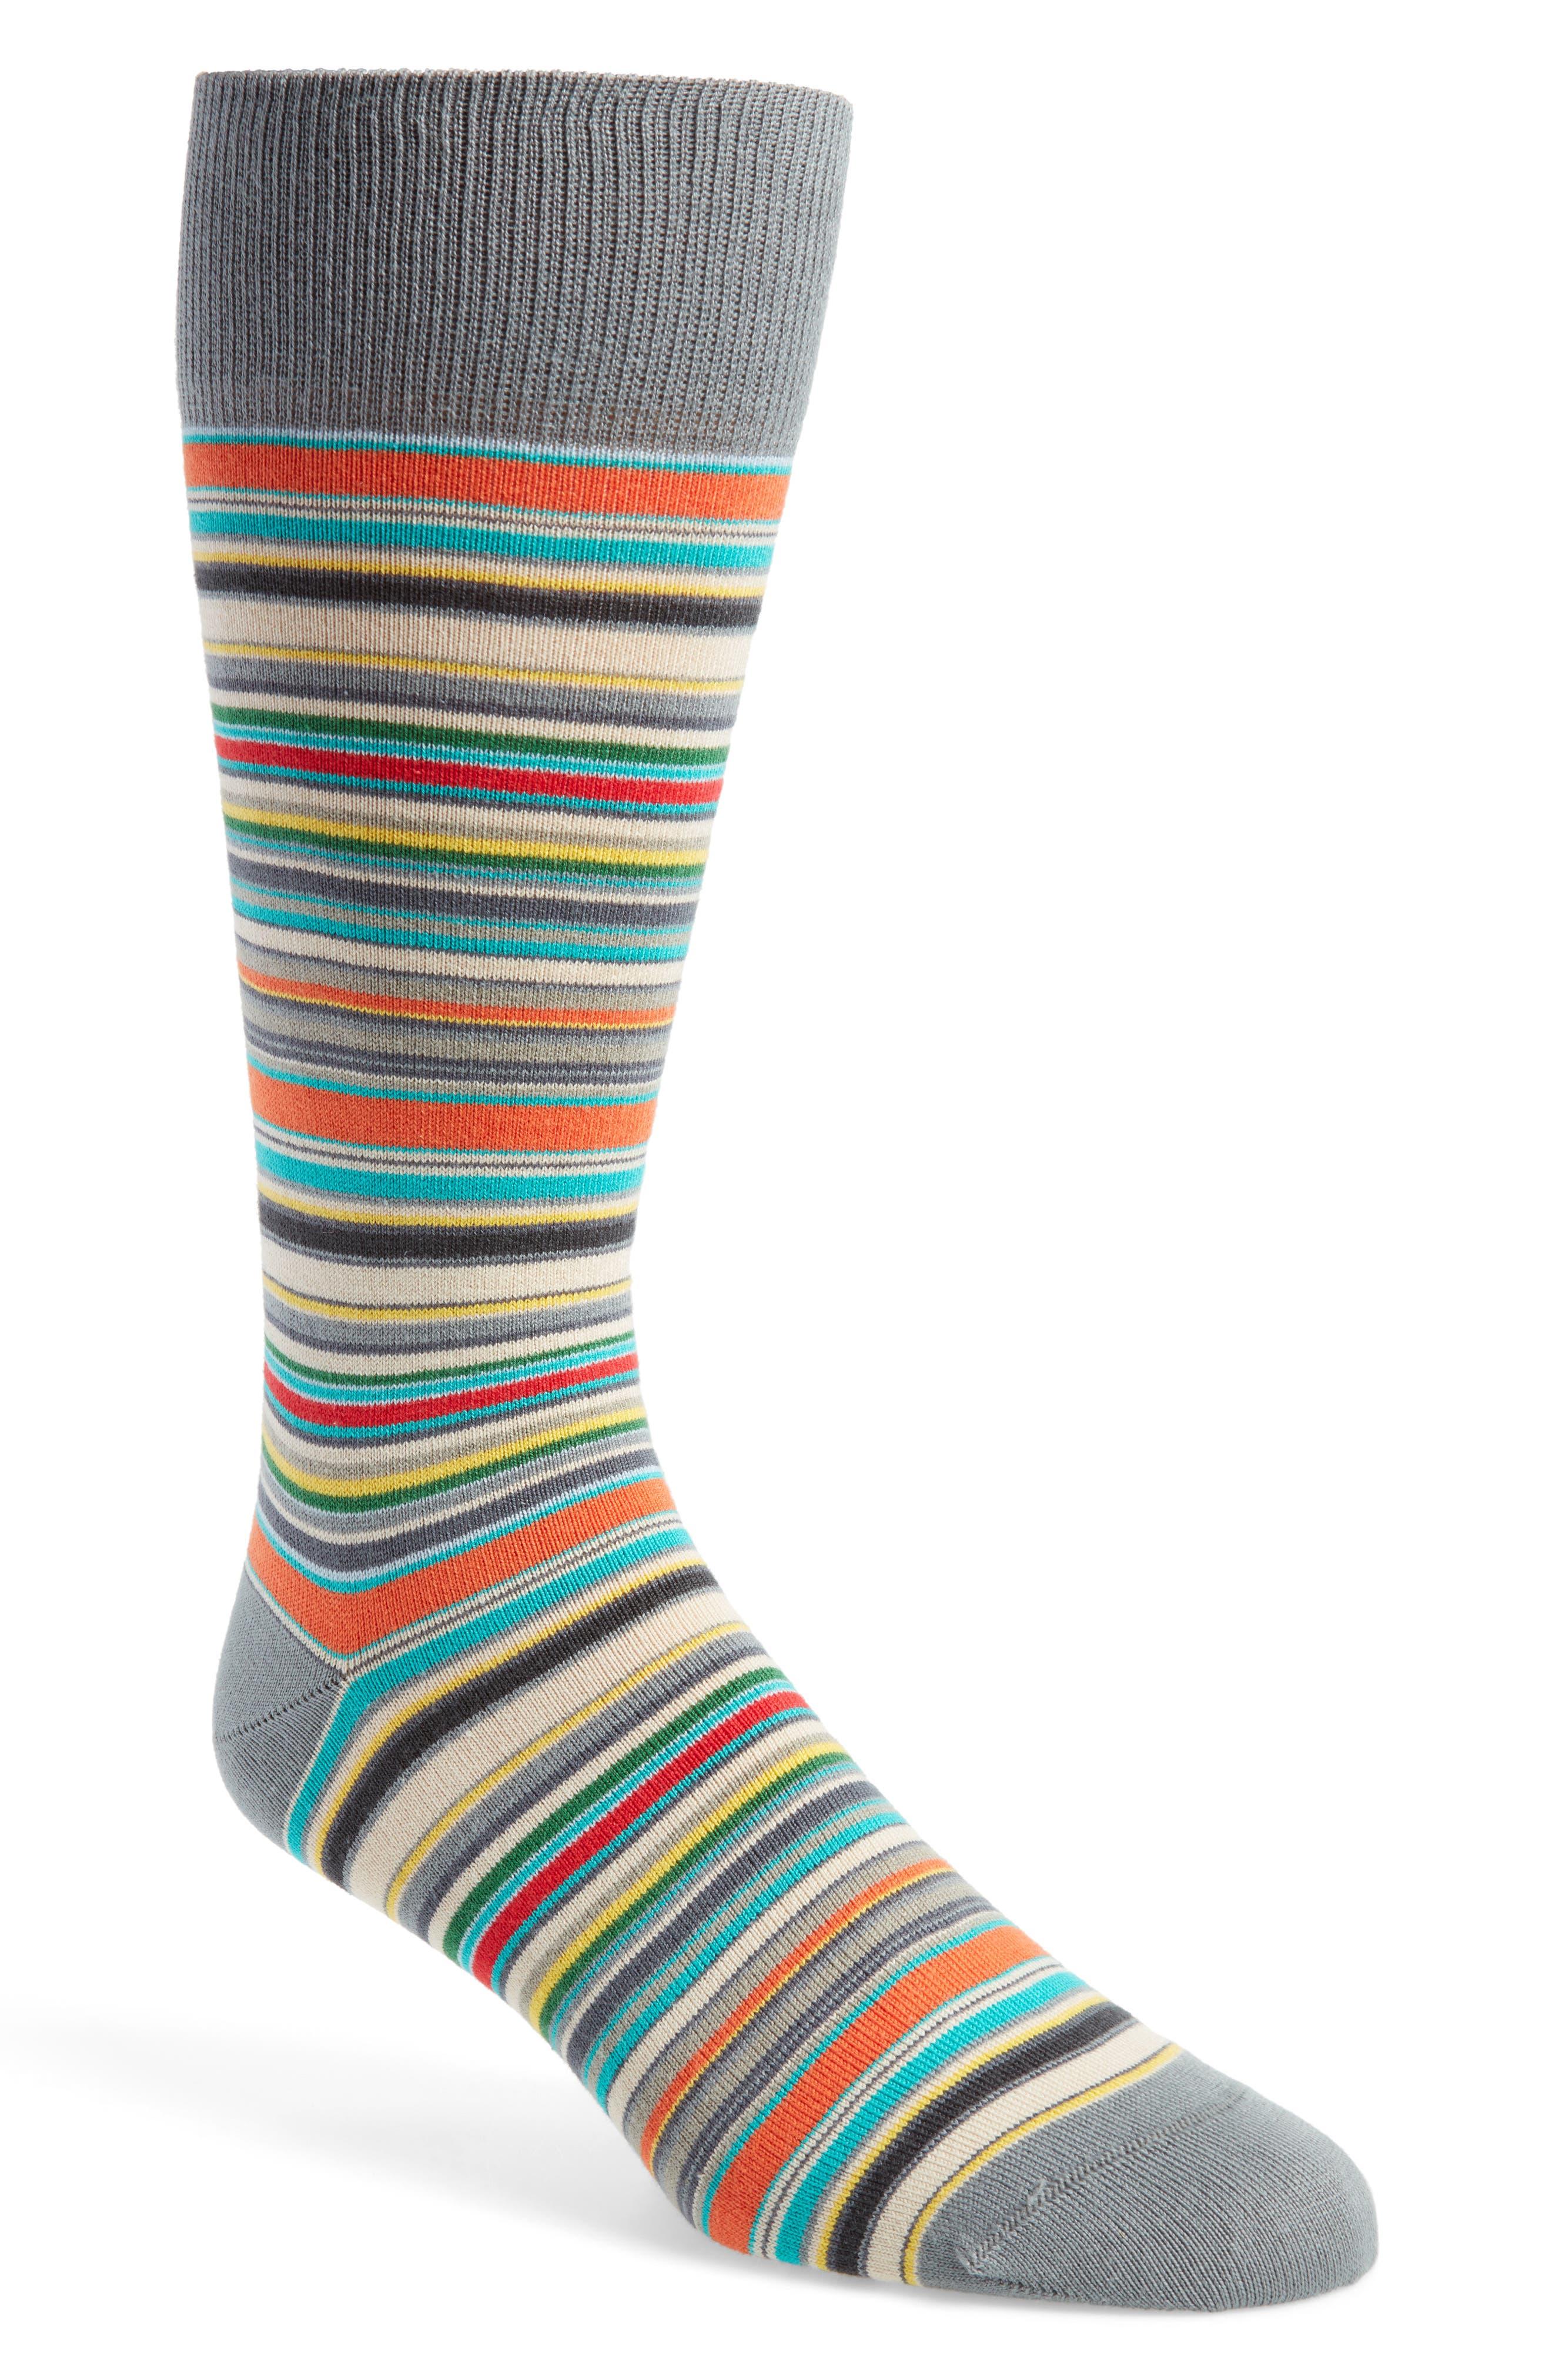 Mens Pin Dot Cotton-Blend Mid-Calf Socks Paul Smith Cheap Sale High Quality 569n8yRPxw